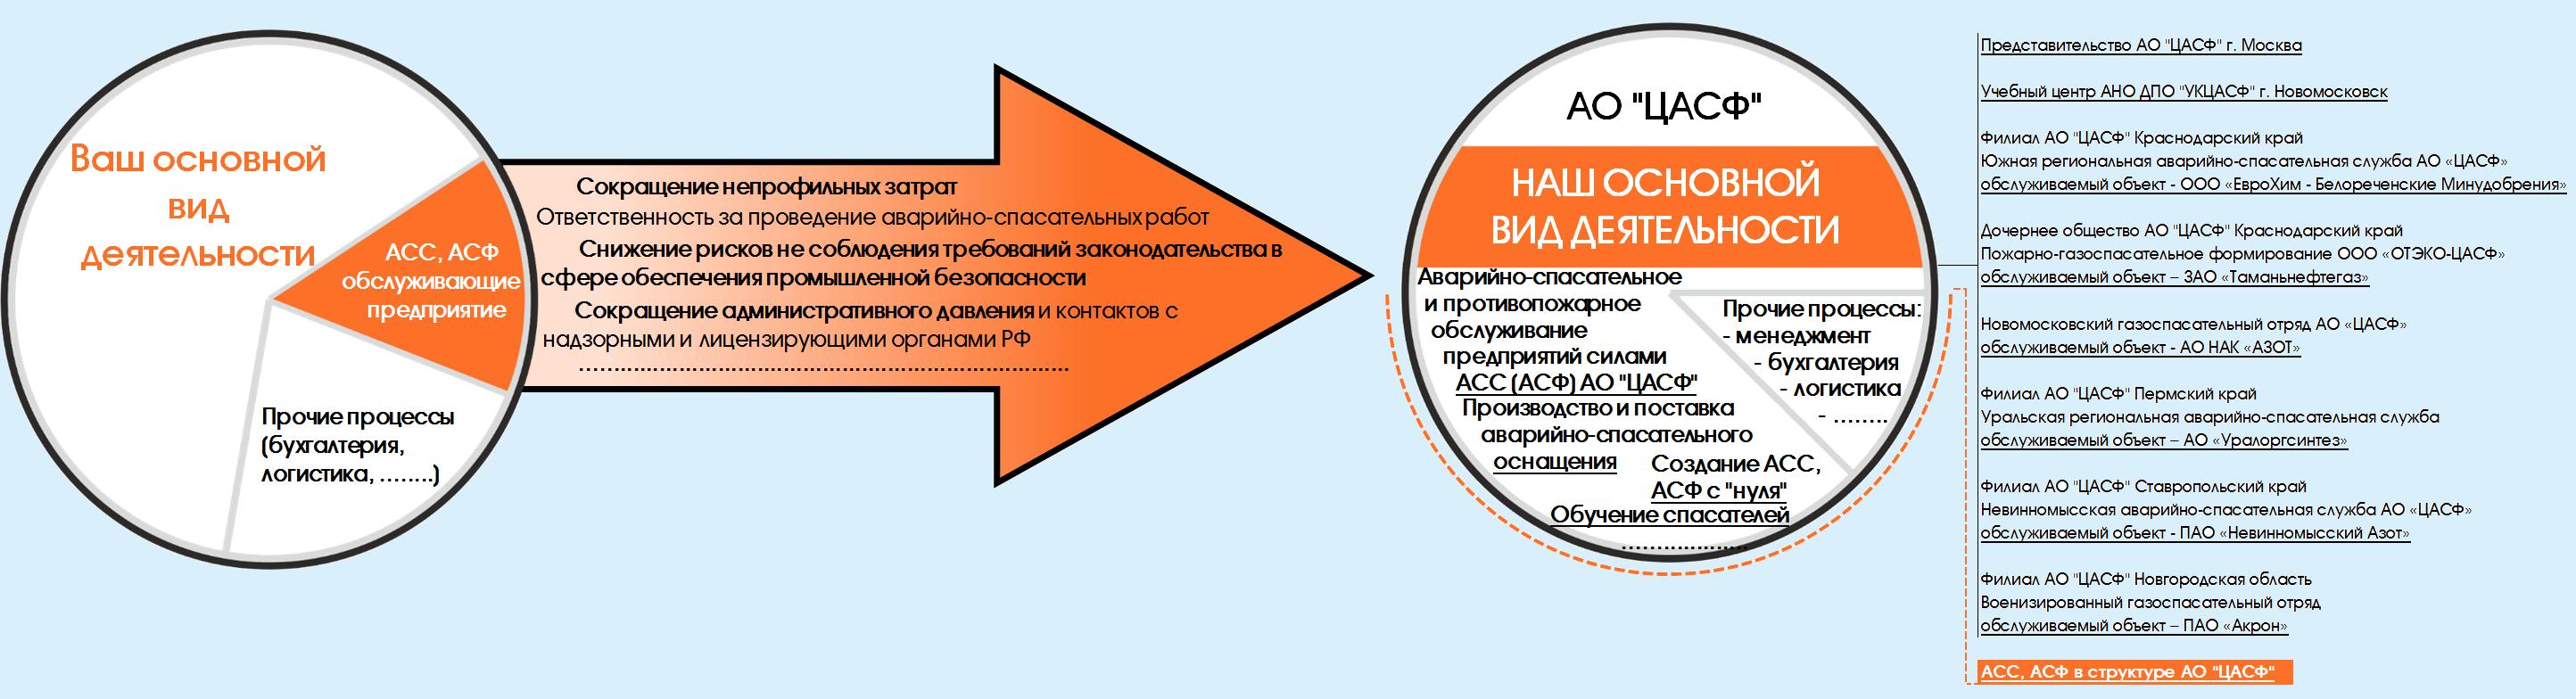 Обслуживание ОПО (Аутсорсинг АСС, АСФ)